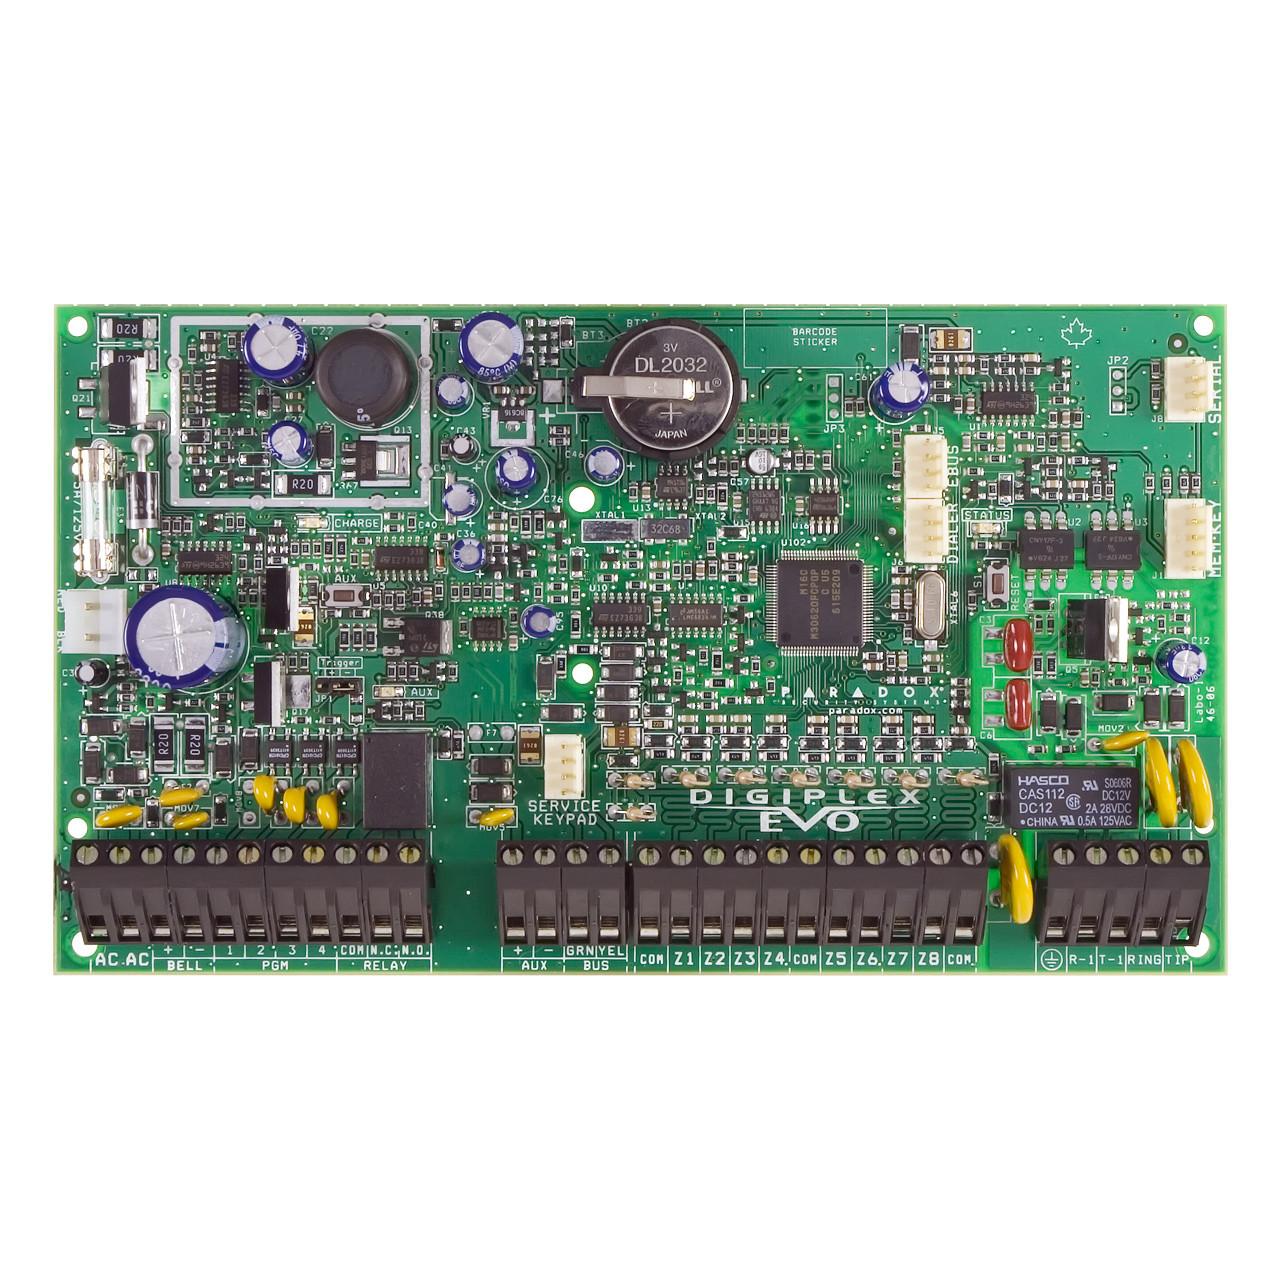 paradox evo192 8 to 192 zone alarm panel tremtech electrical rh store tremtech com paradox mg5050 installation guide paradox mg5050 programming guide